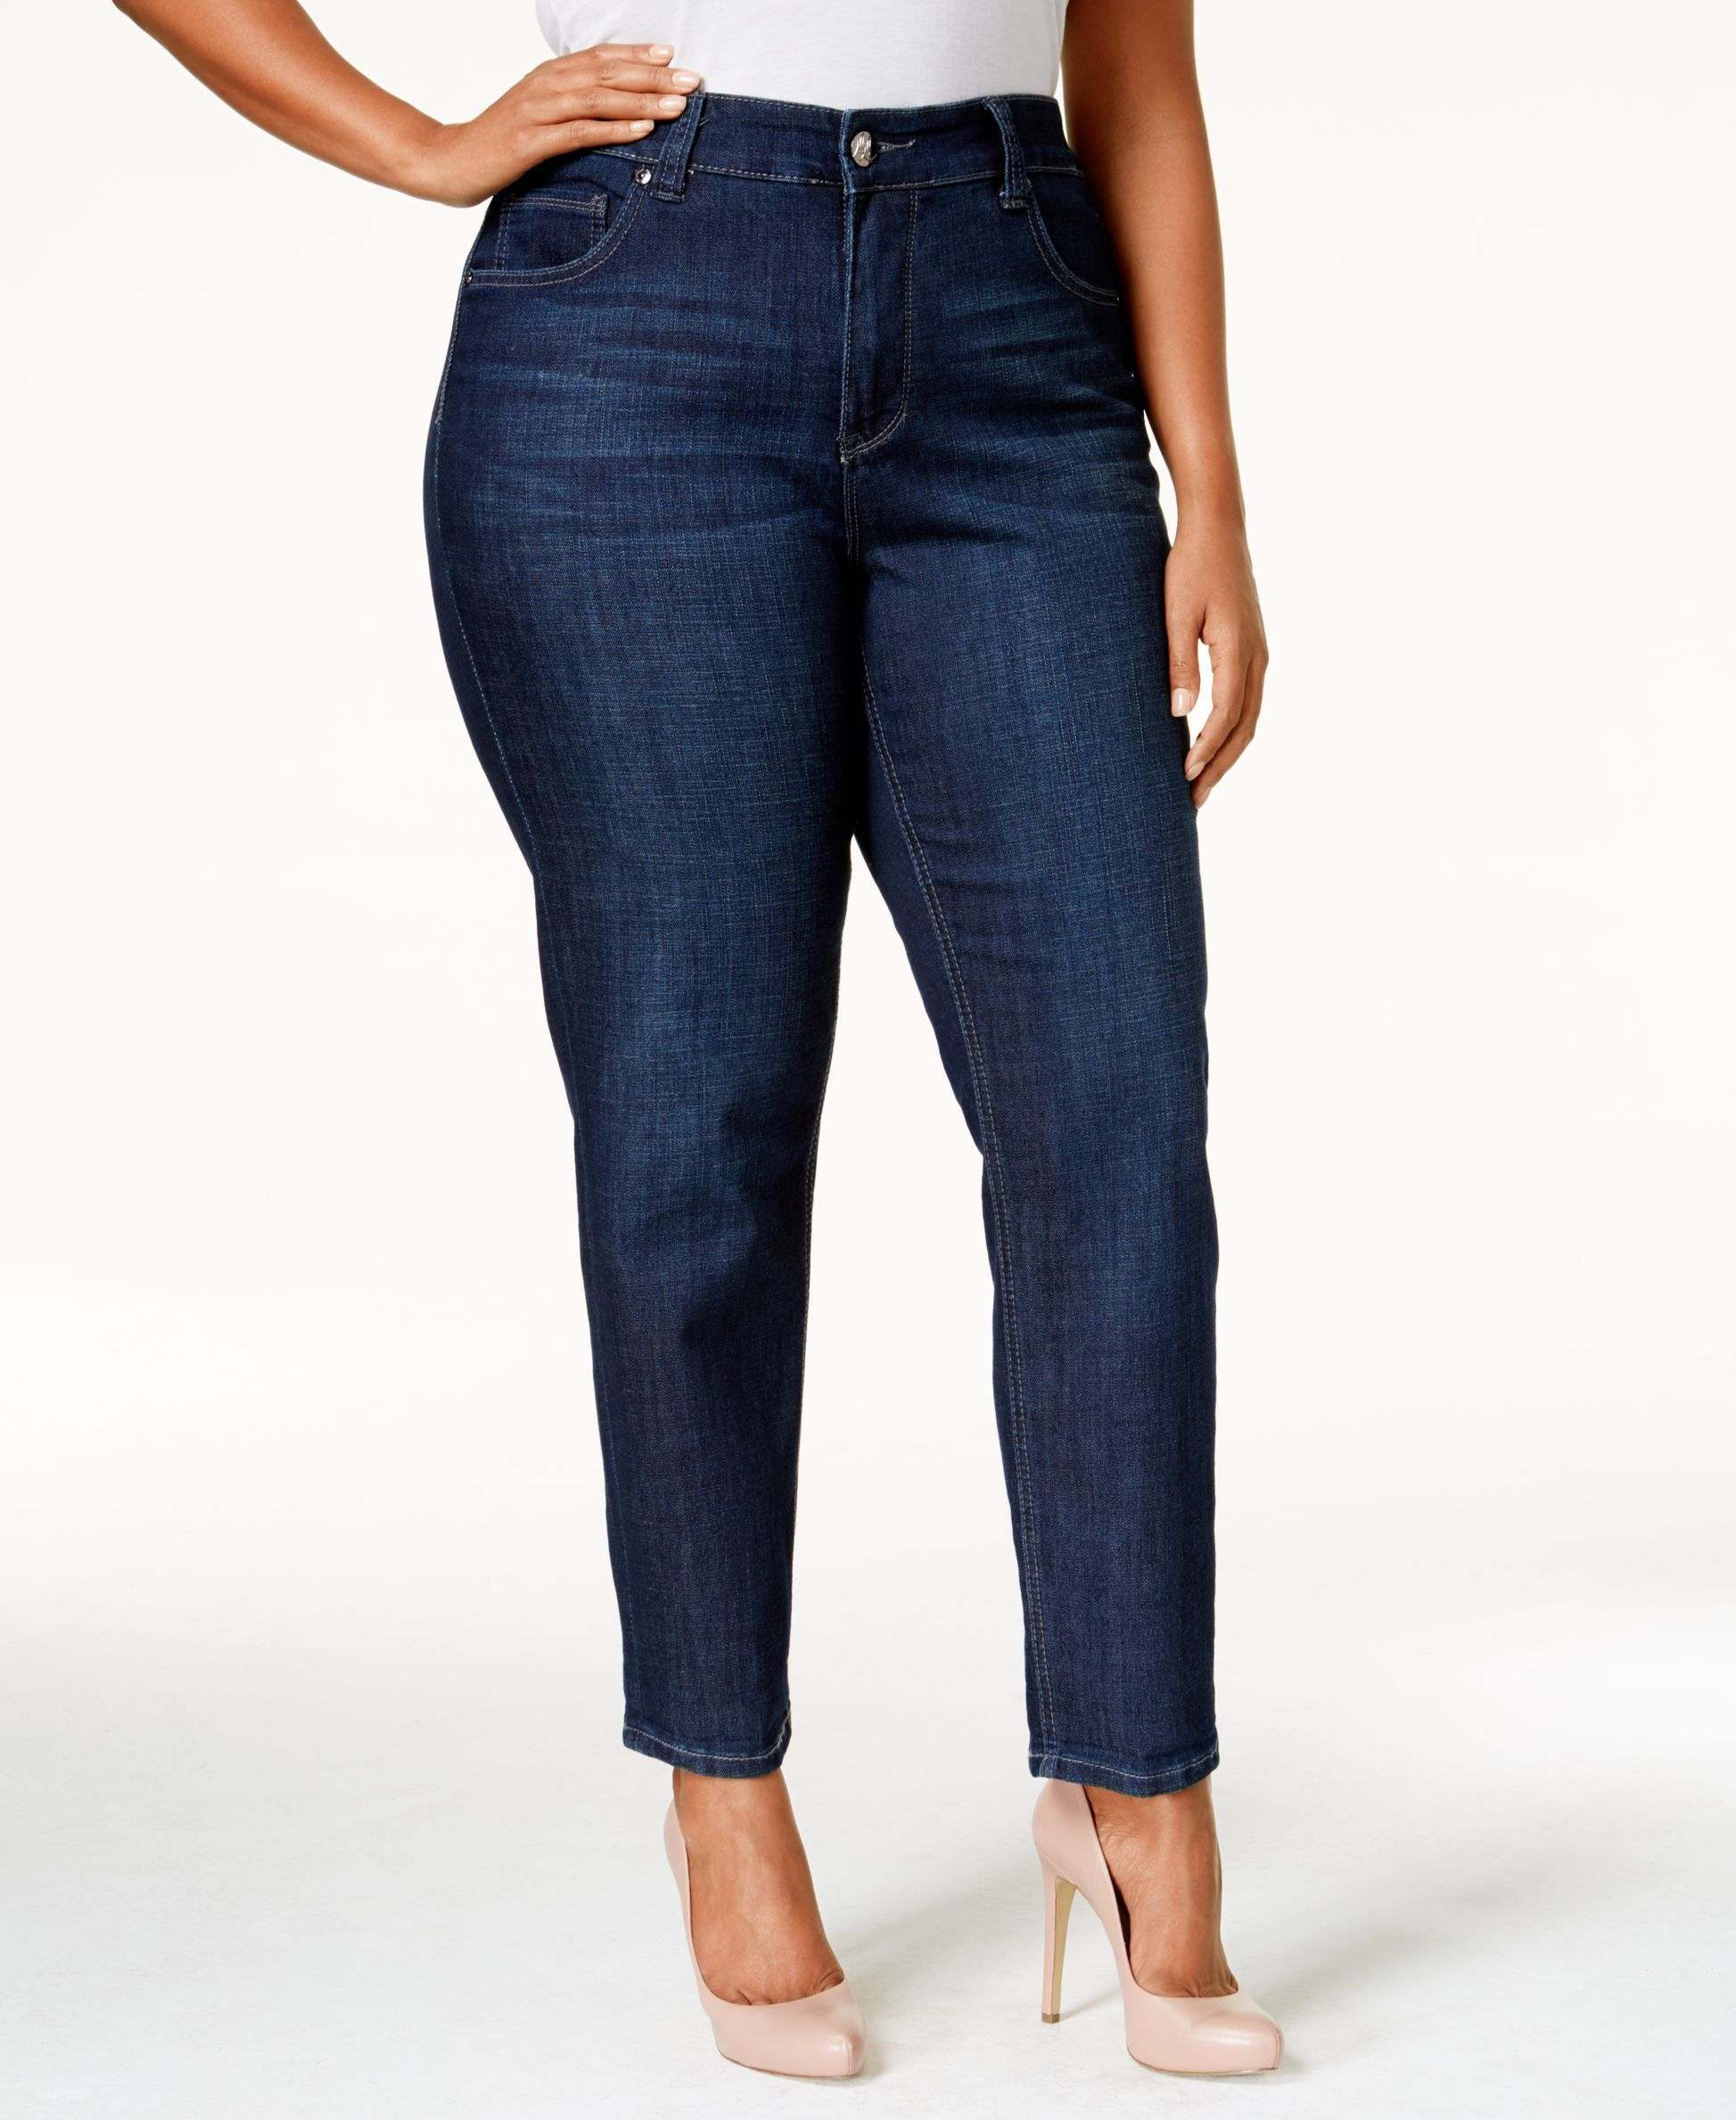 cf64f5d1a2da5 Melissa McCarthy Seven7 Plus Size Gordon Wash Straight-Leg Jeans ...